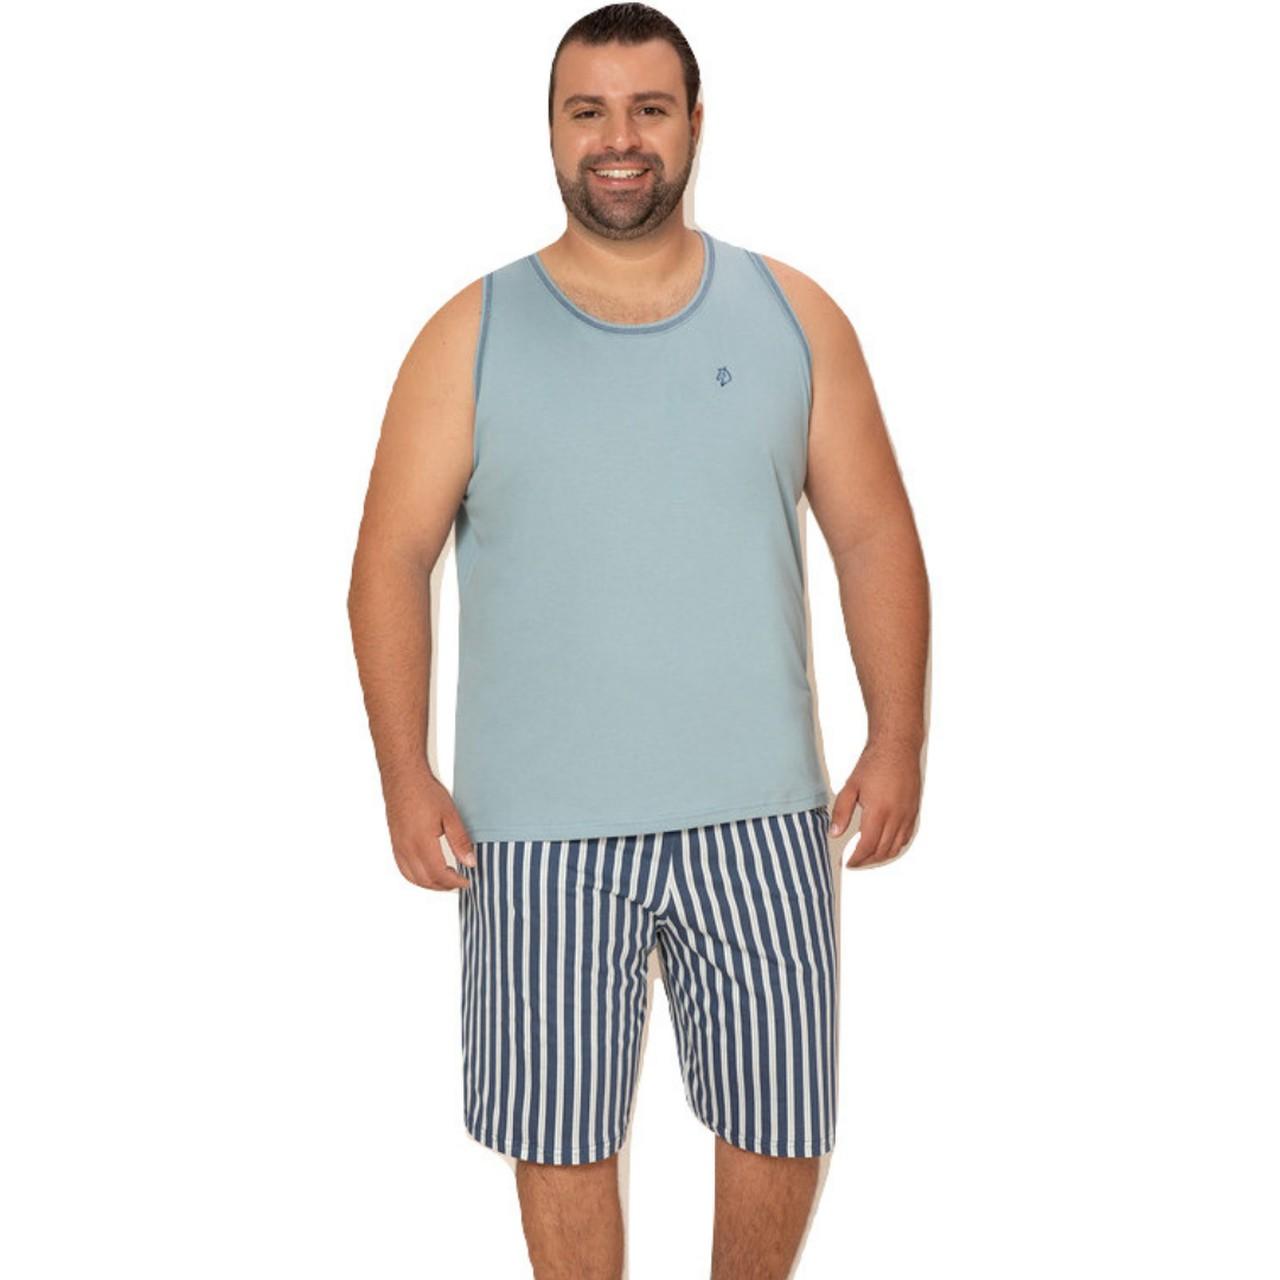 Pijama masculino blusa regata bermuda plus size adulto verão